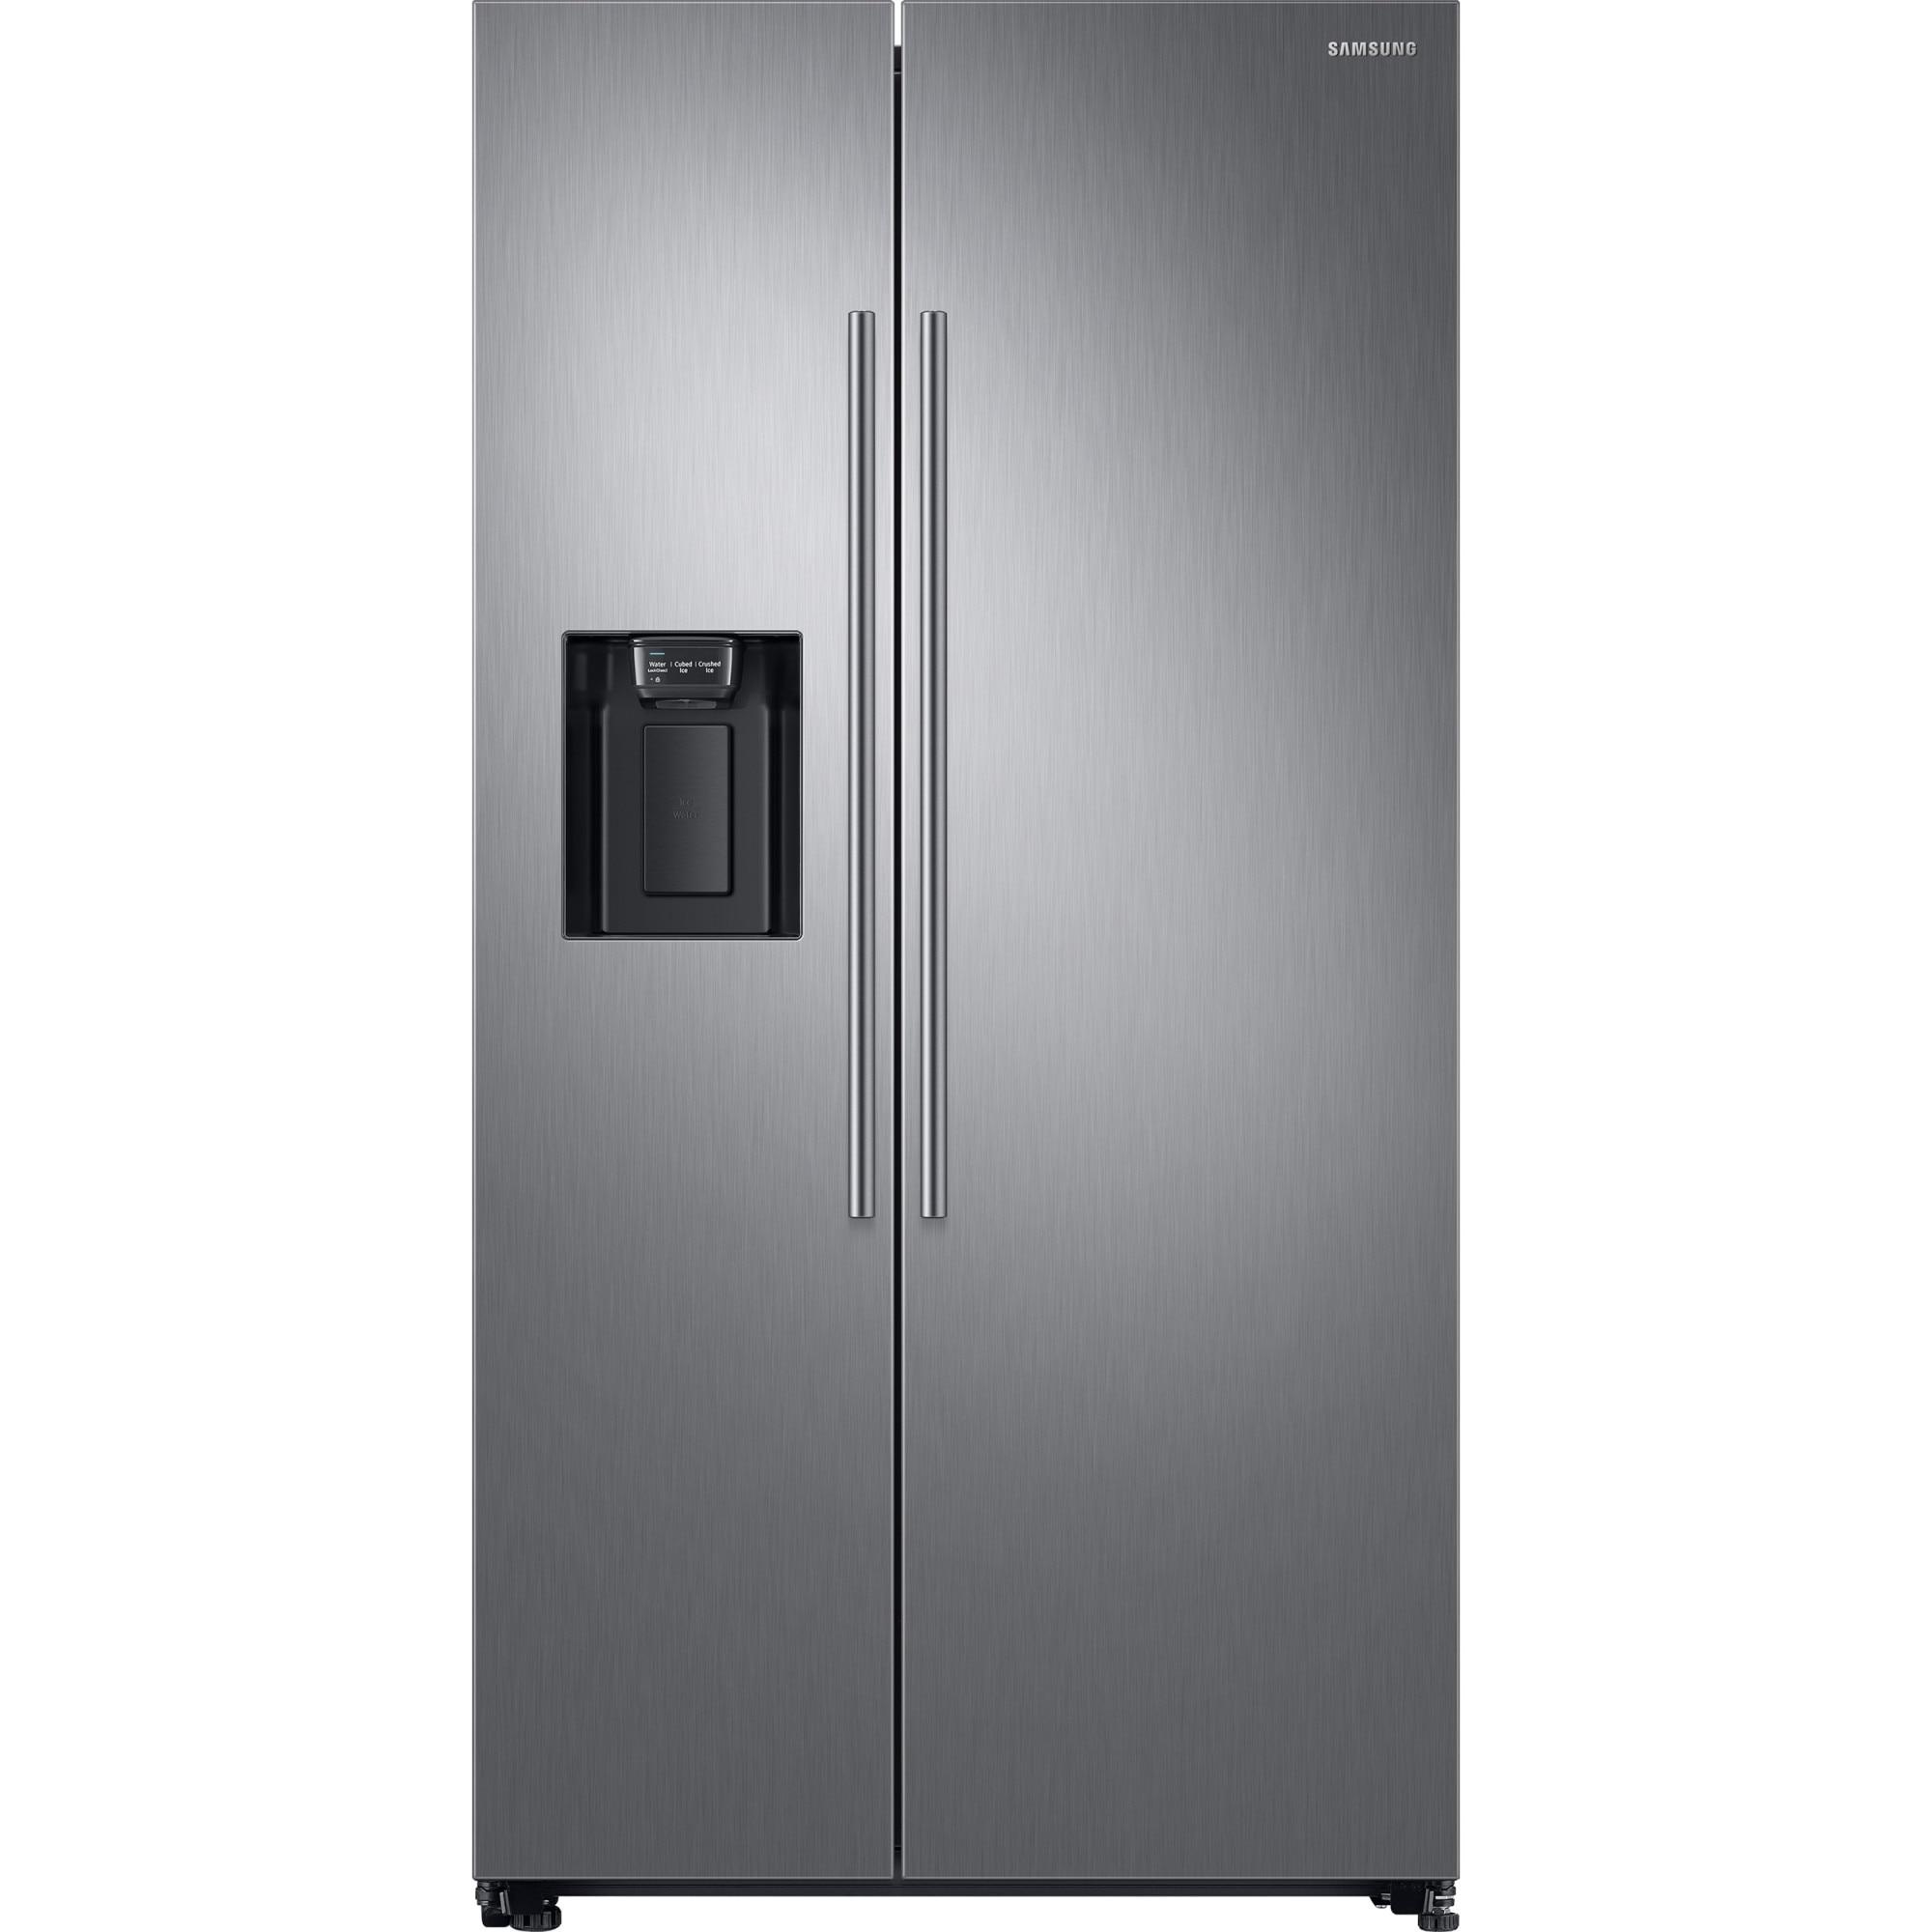 Fotografie Side by side Samsung RS67N8210S9/EF, 609 l, Clasa F, Full NoFrost, Twin Cooling, Compresor Digital Invertor, Display, Dispenser , H 178 cm, Inox